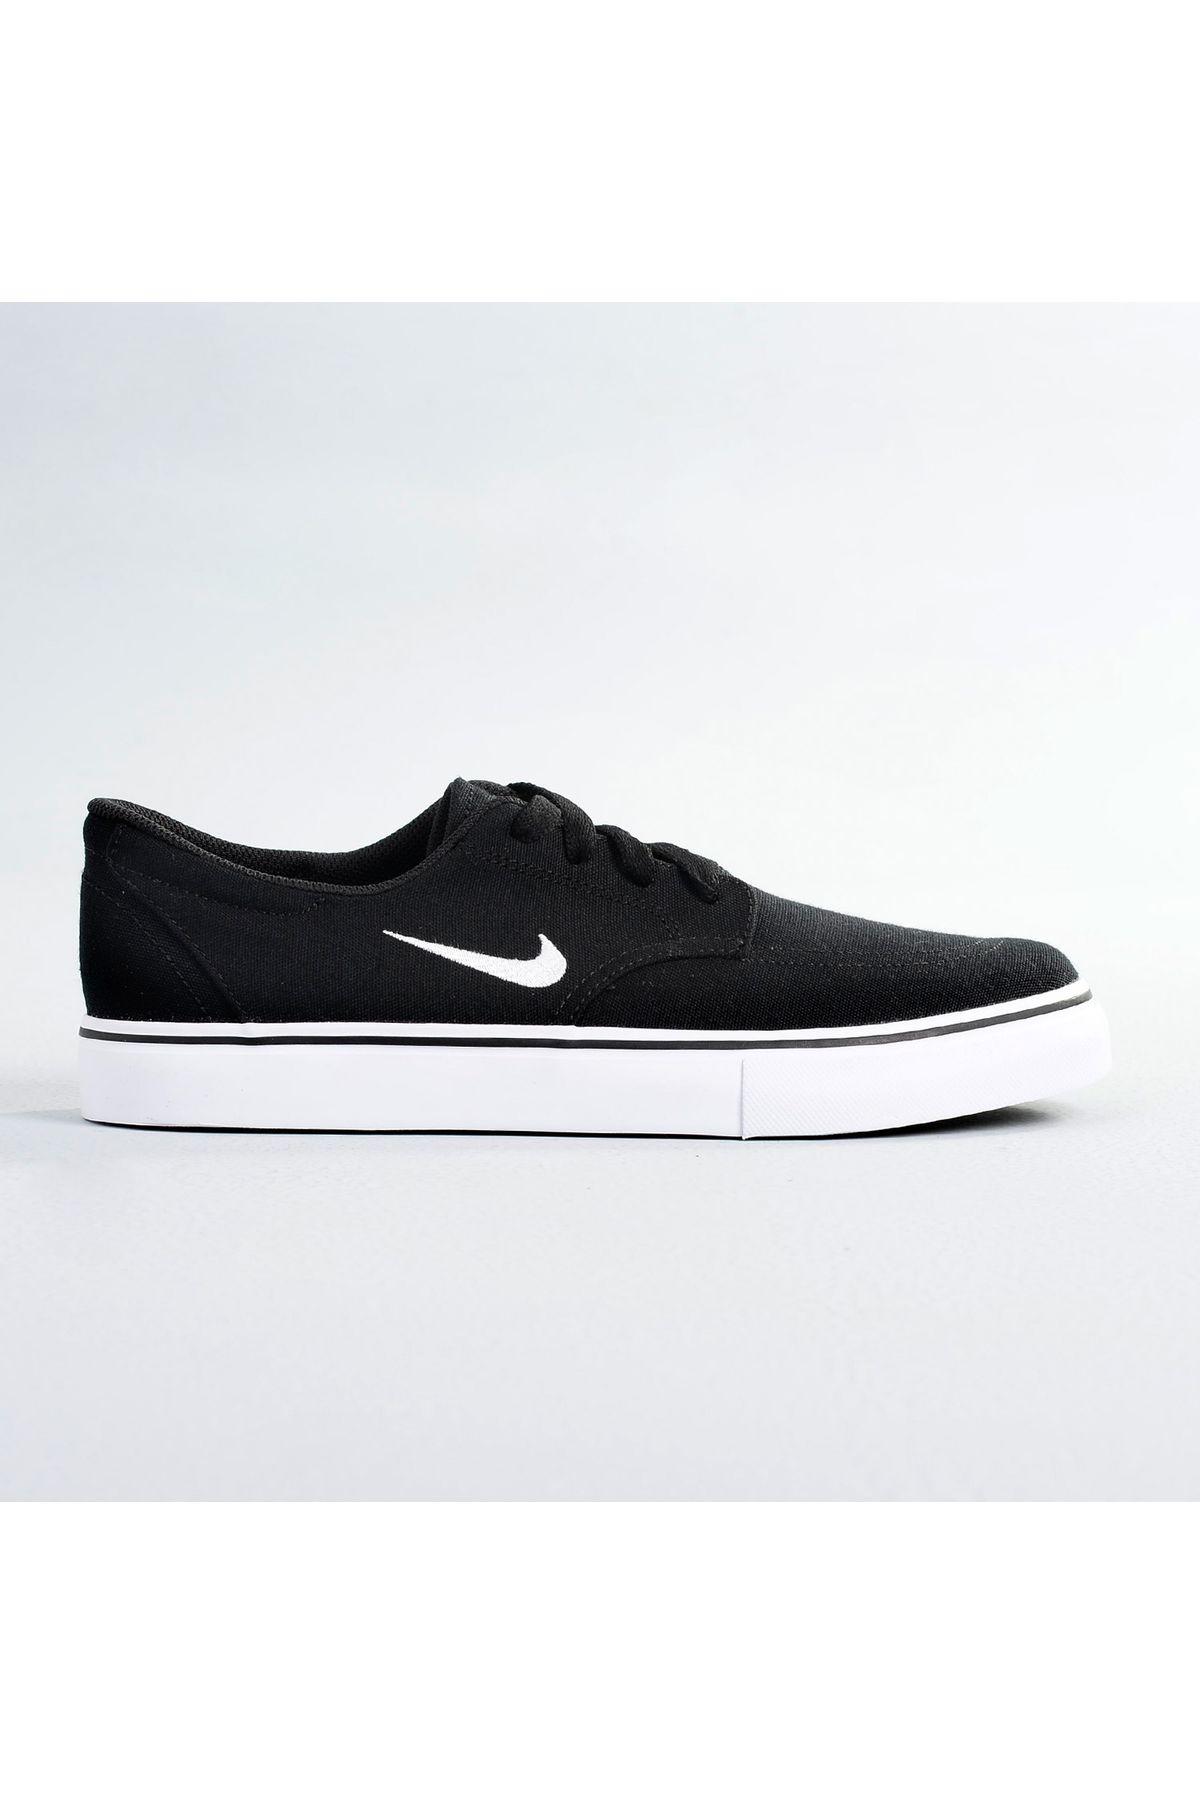 48738e3df5d Tênis Nike Sb Clutch Skateboarding Shoe